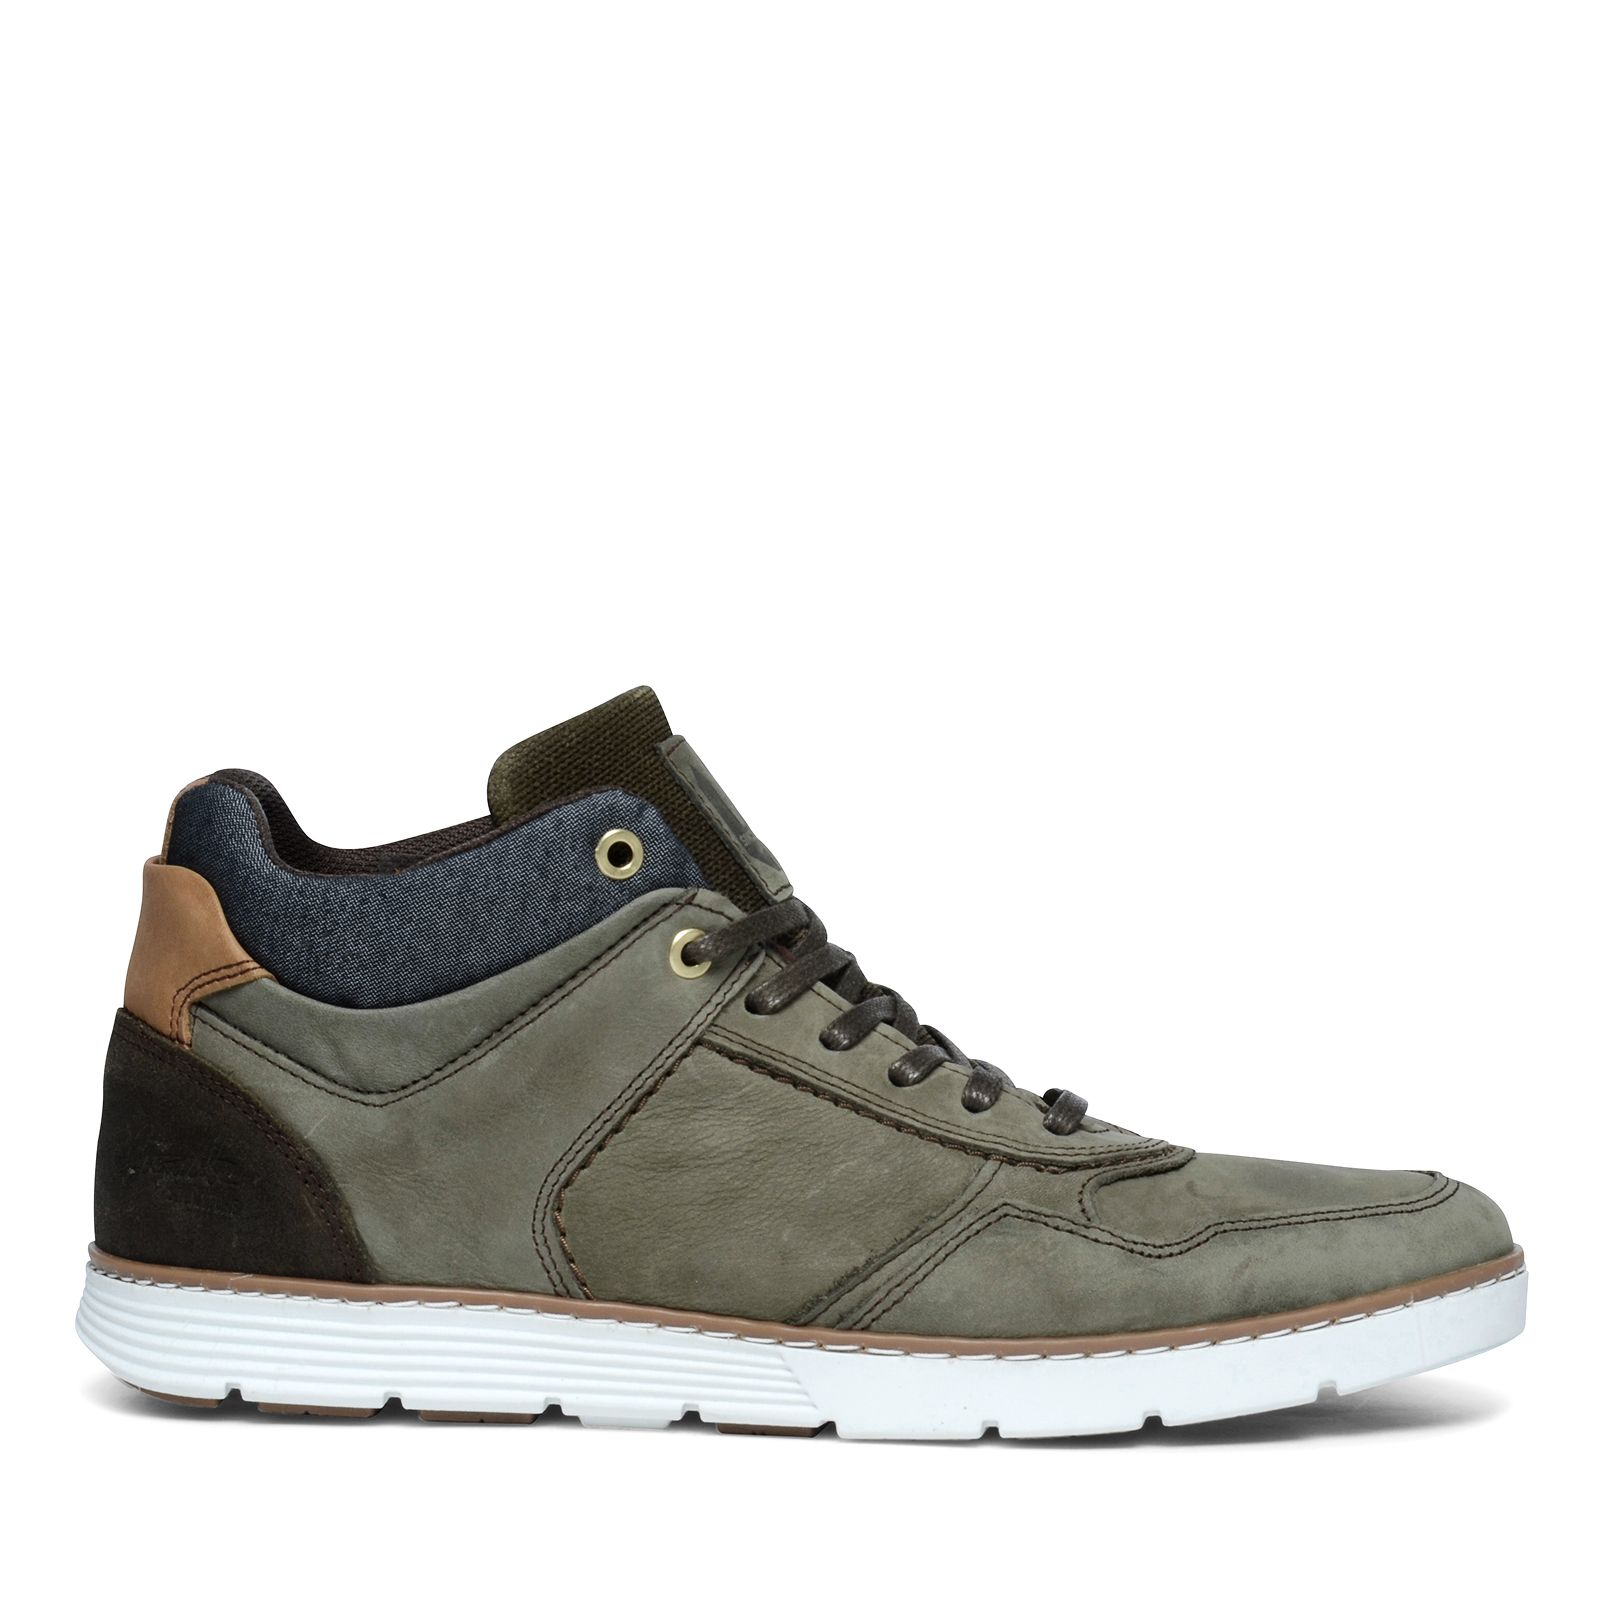 Hoge sneakers khaki - Herenschoenen - SACHA